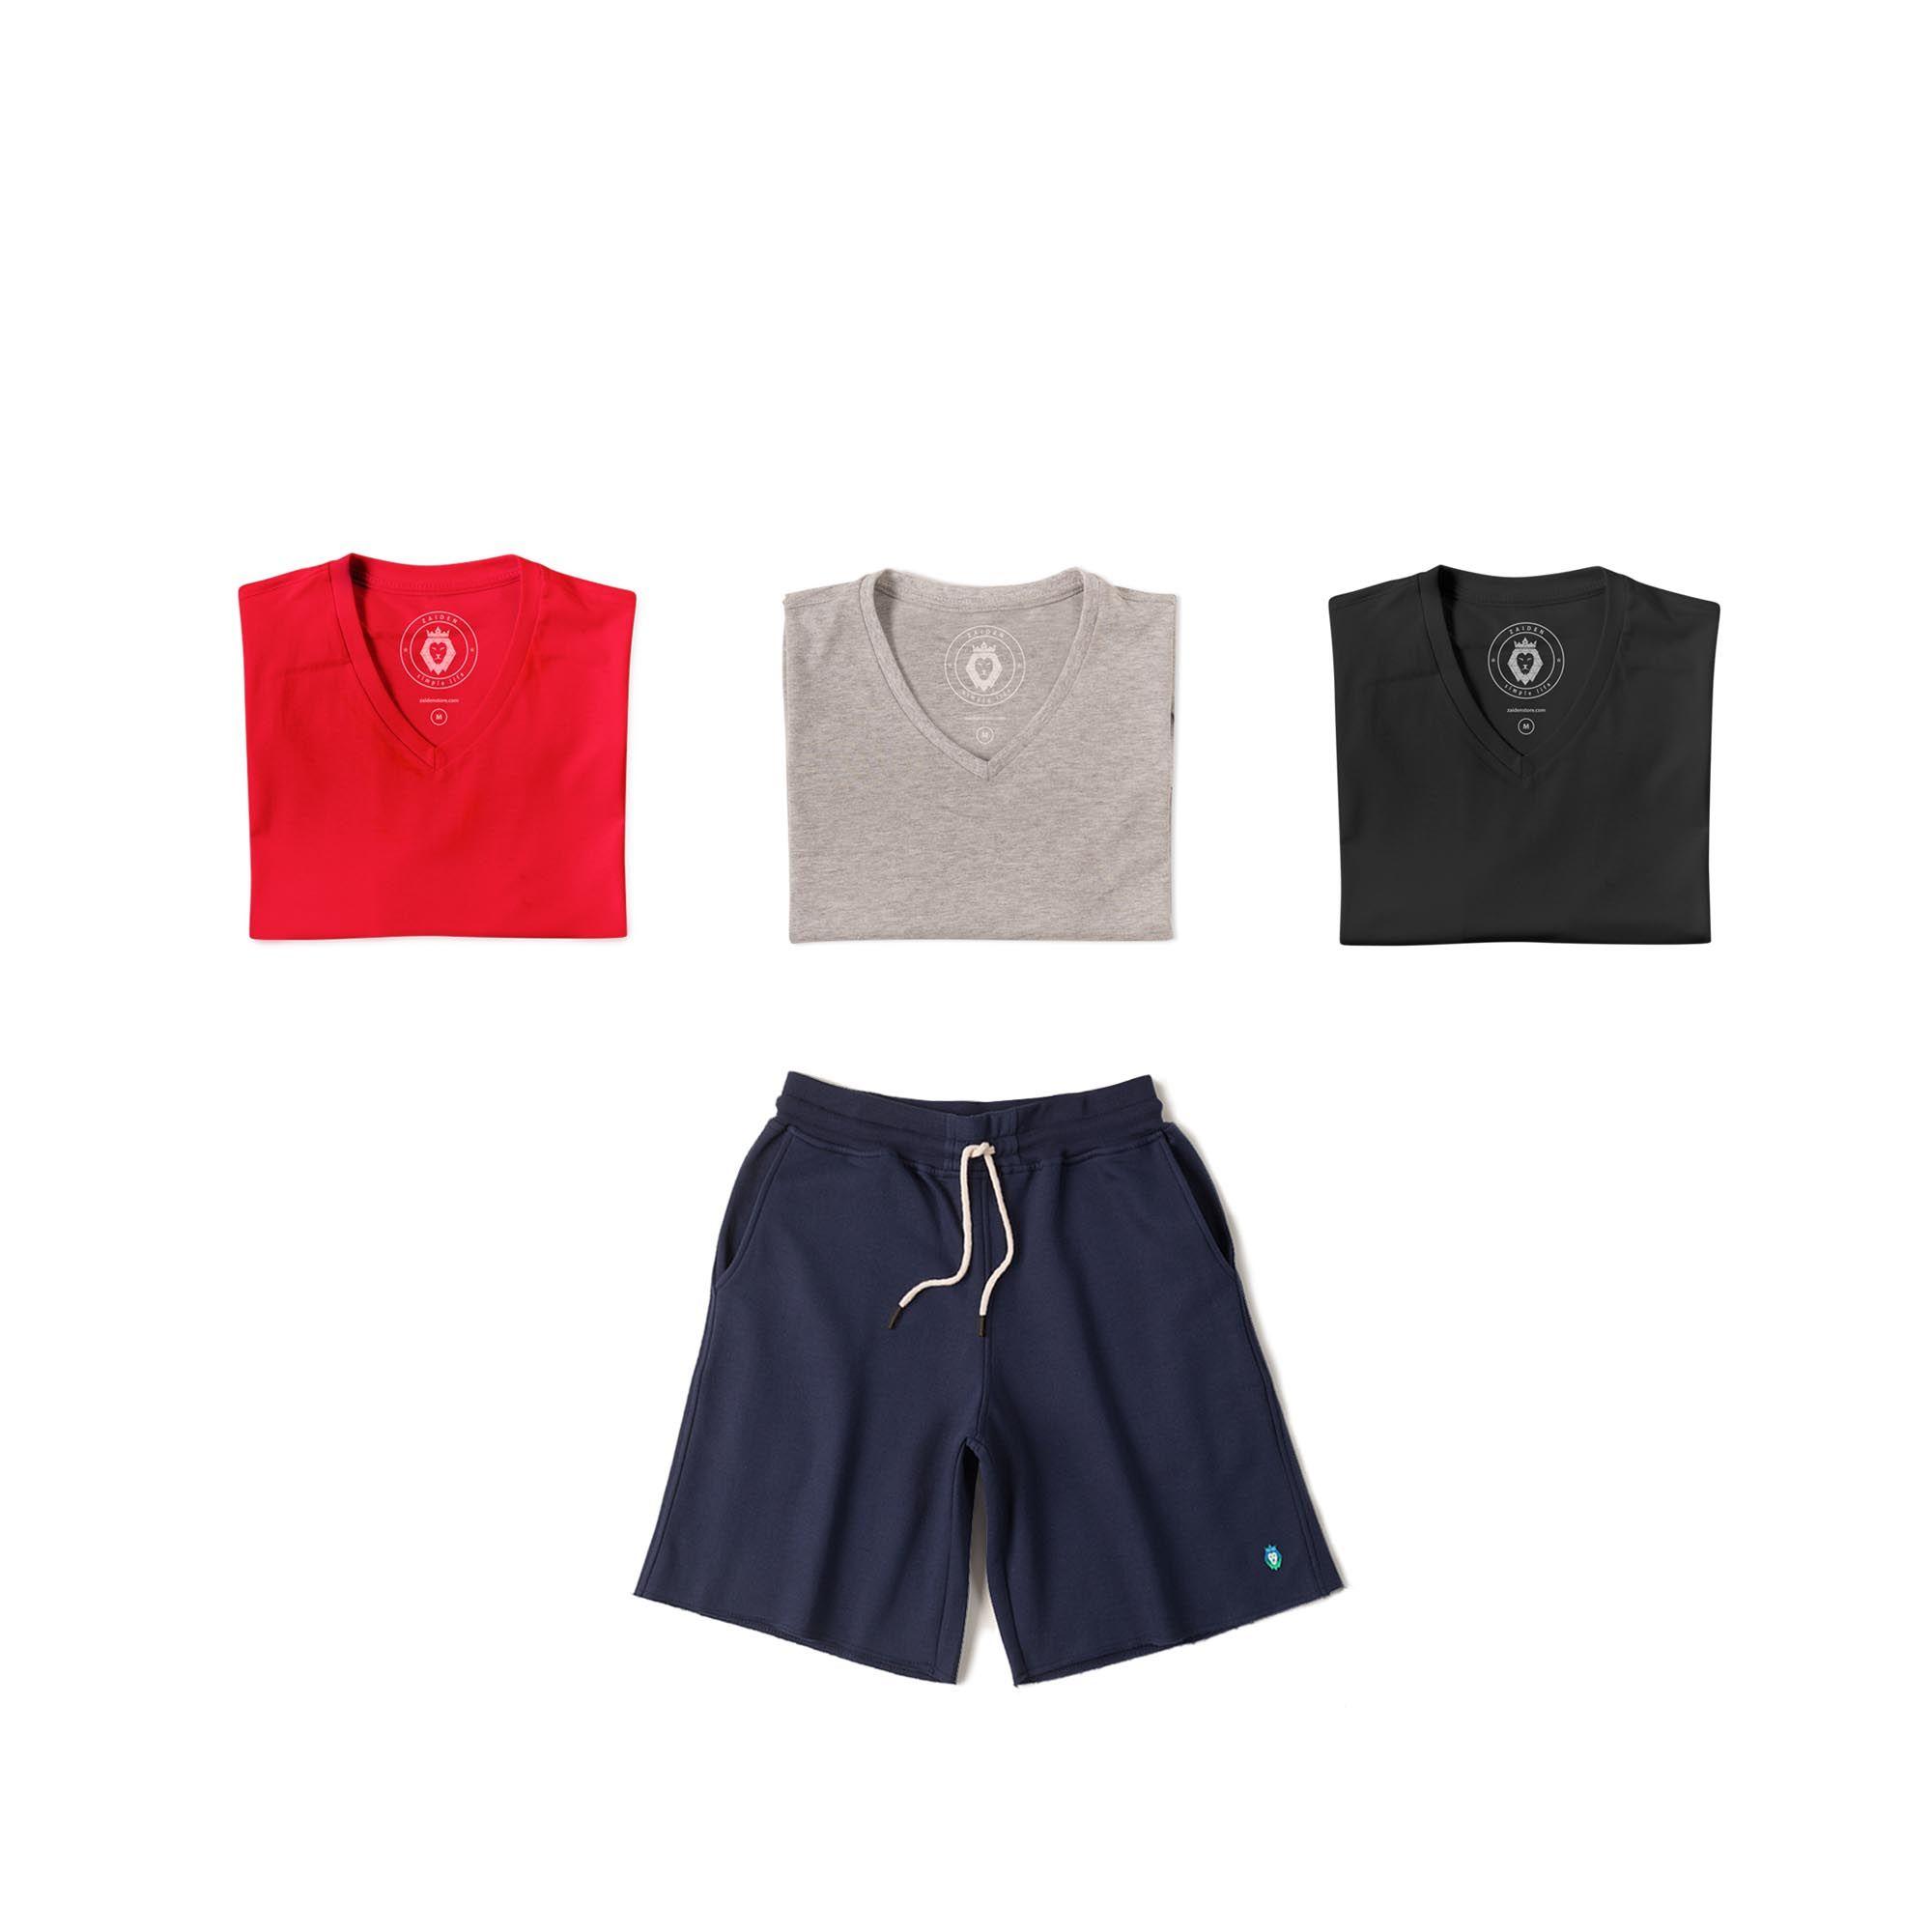 Kit 1 Bermuda Basic Azul Marinho + 3 T-Shirts Basic Mescla Vermelha Preta Zaiden Masculina